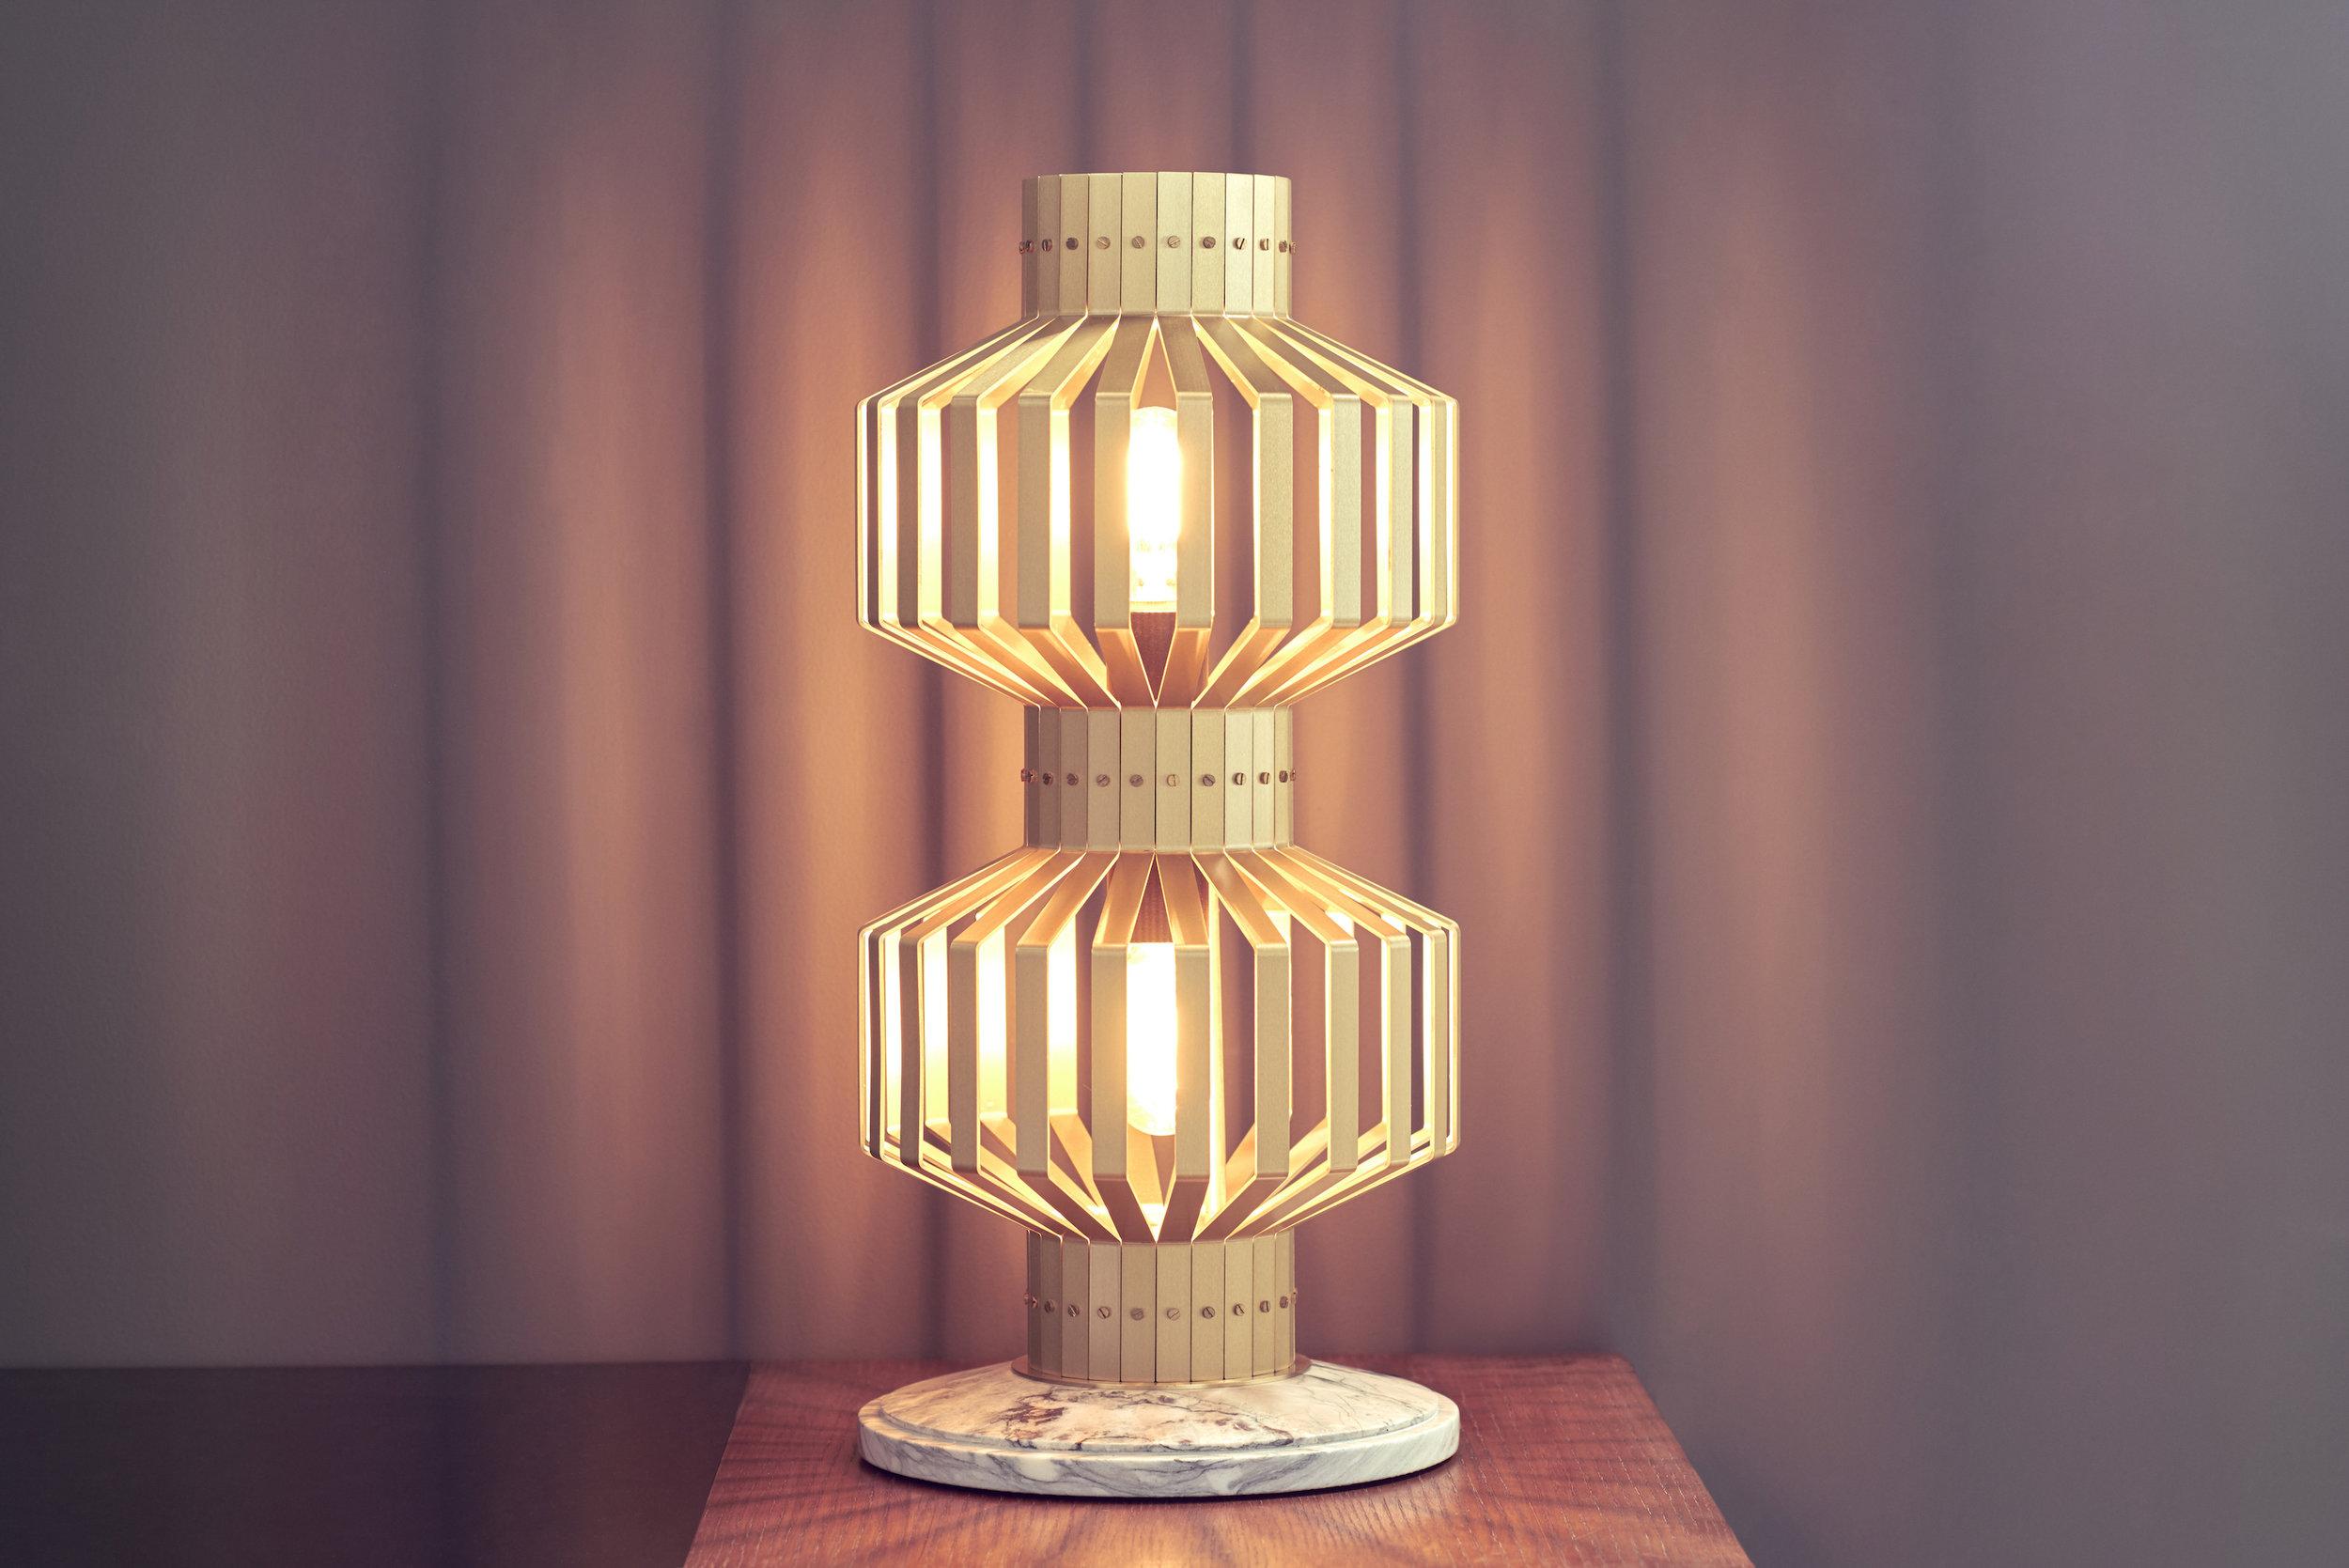 NaderGammas-LightingDesign-Tower.jpg